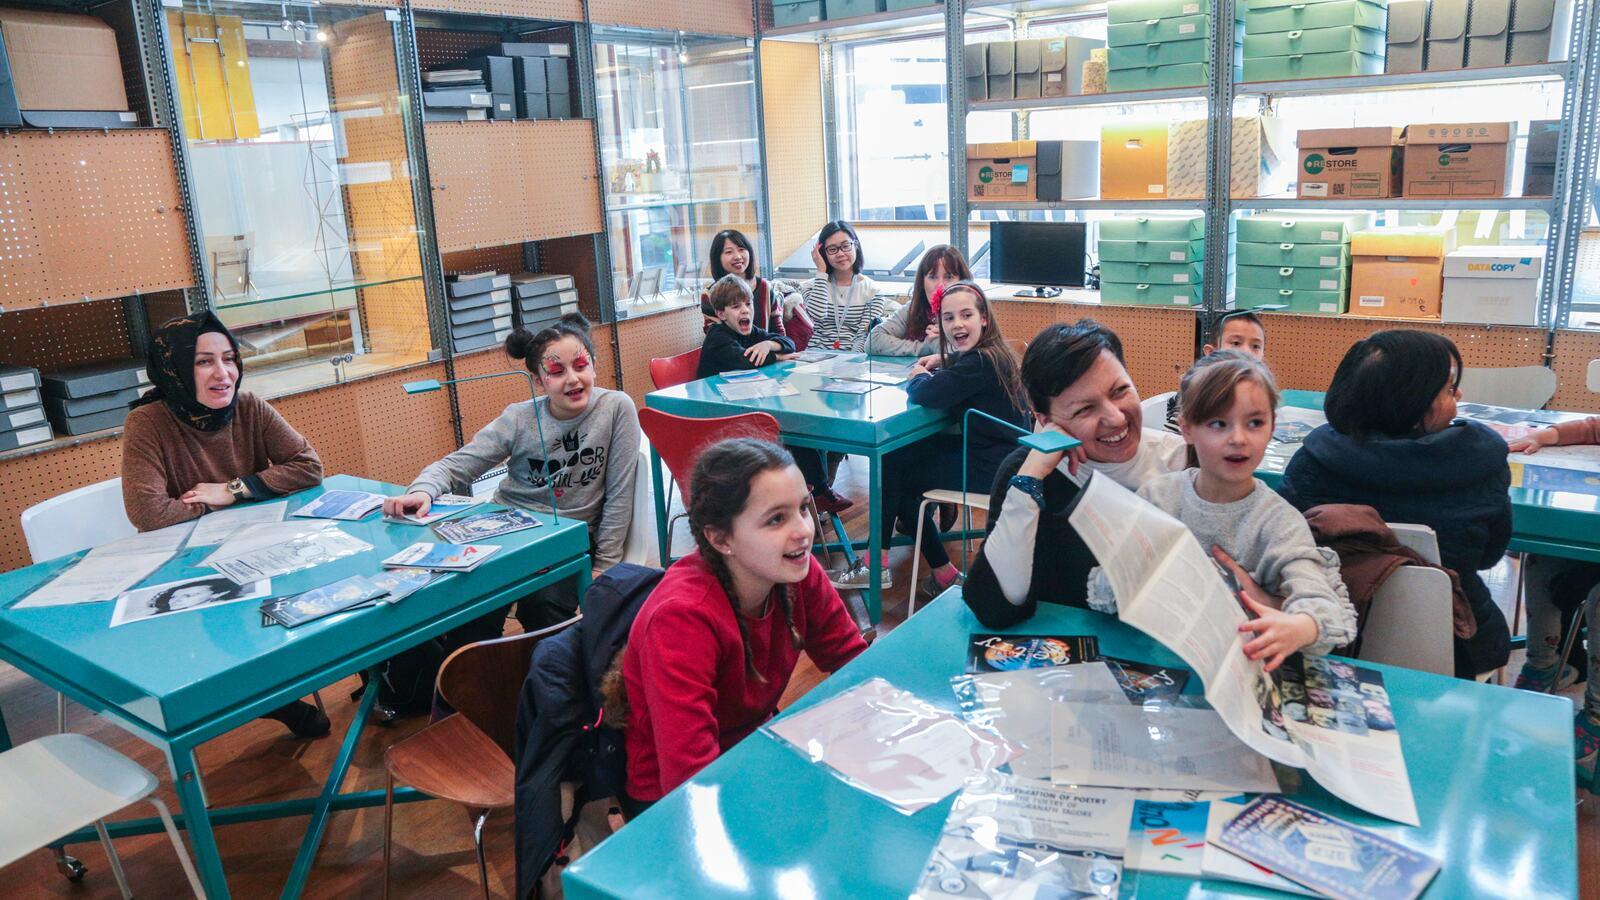 Schools workshop at Southbank Centre